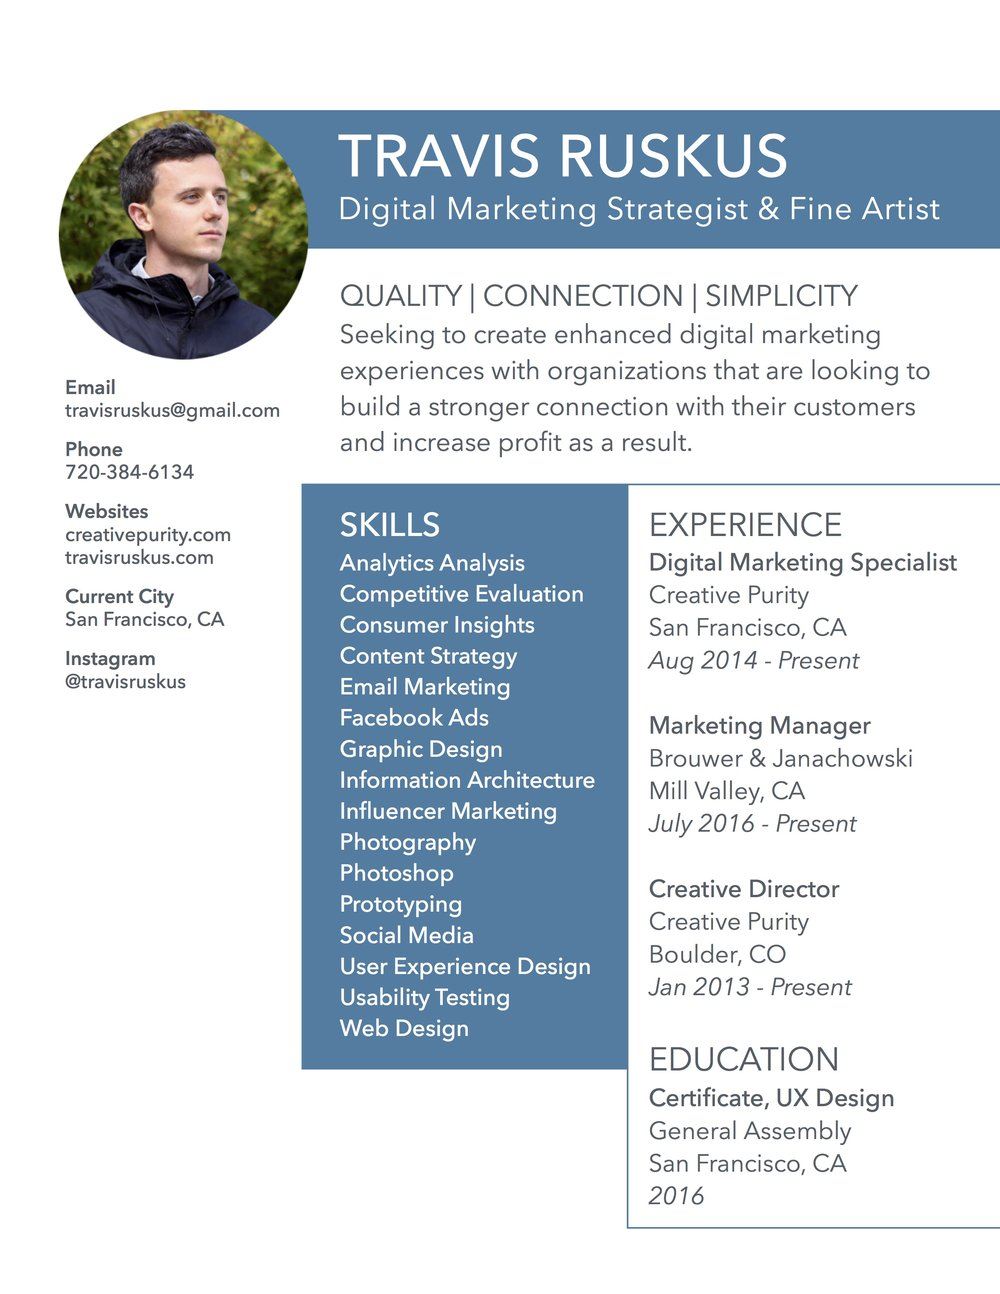 Travis Ruskus Resume.jpg